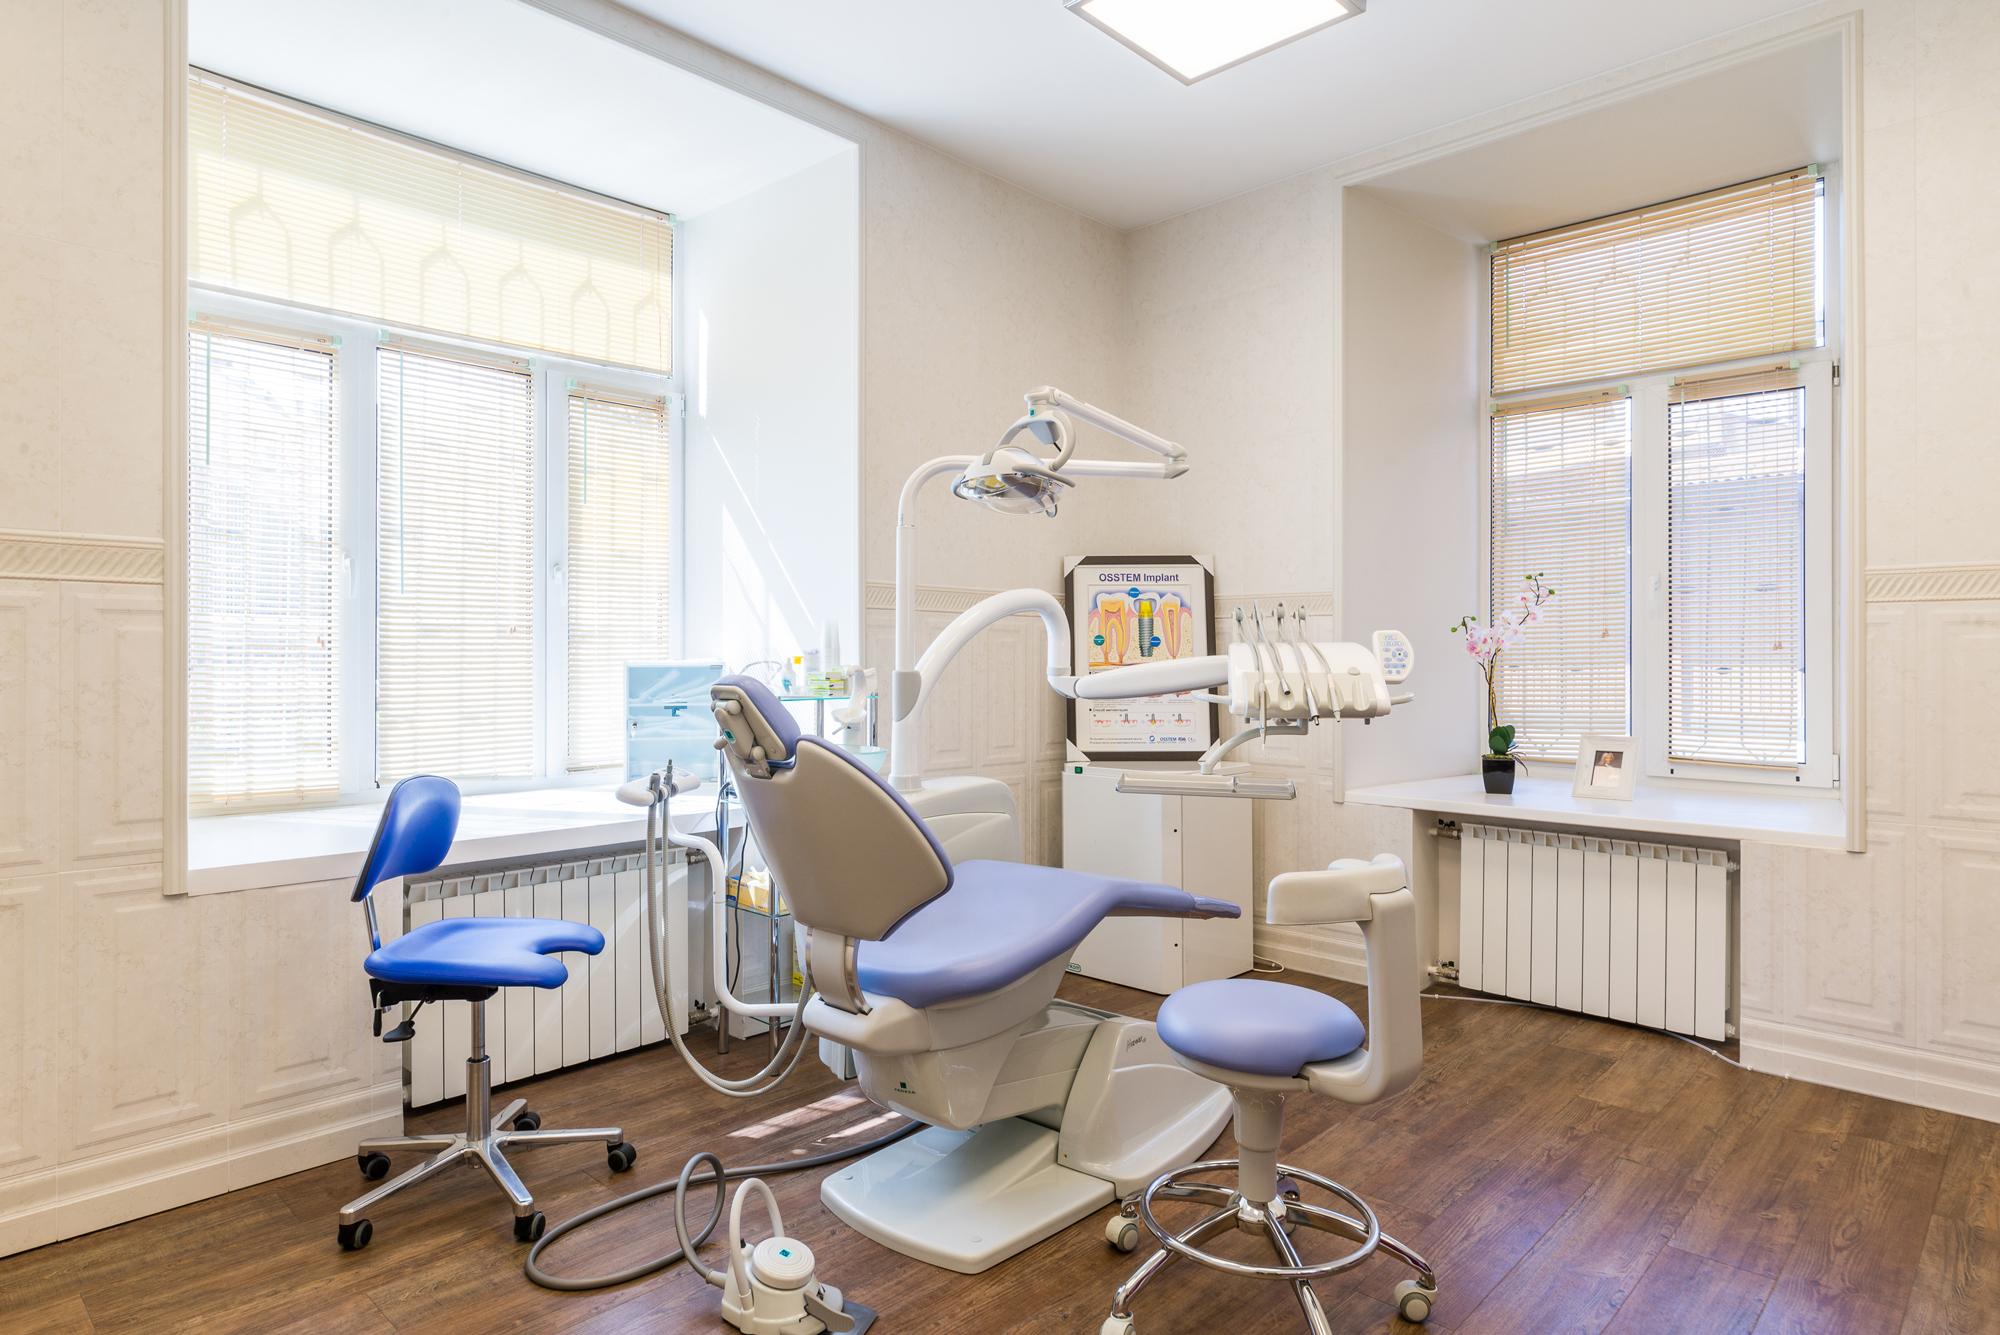 Интерьер медицинские центры дизайн